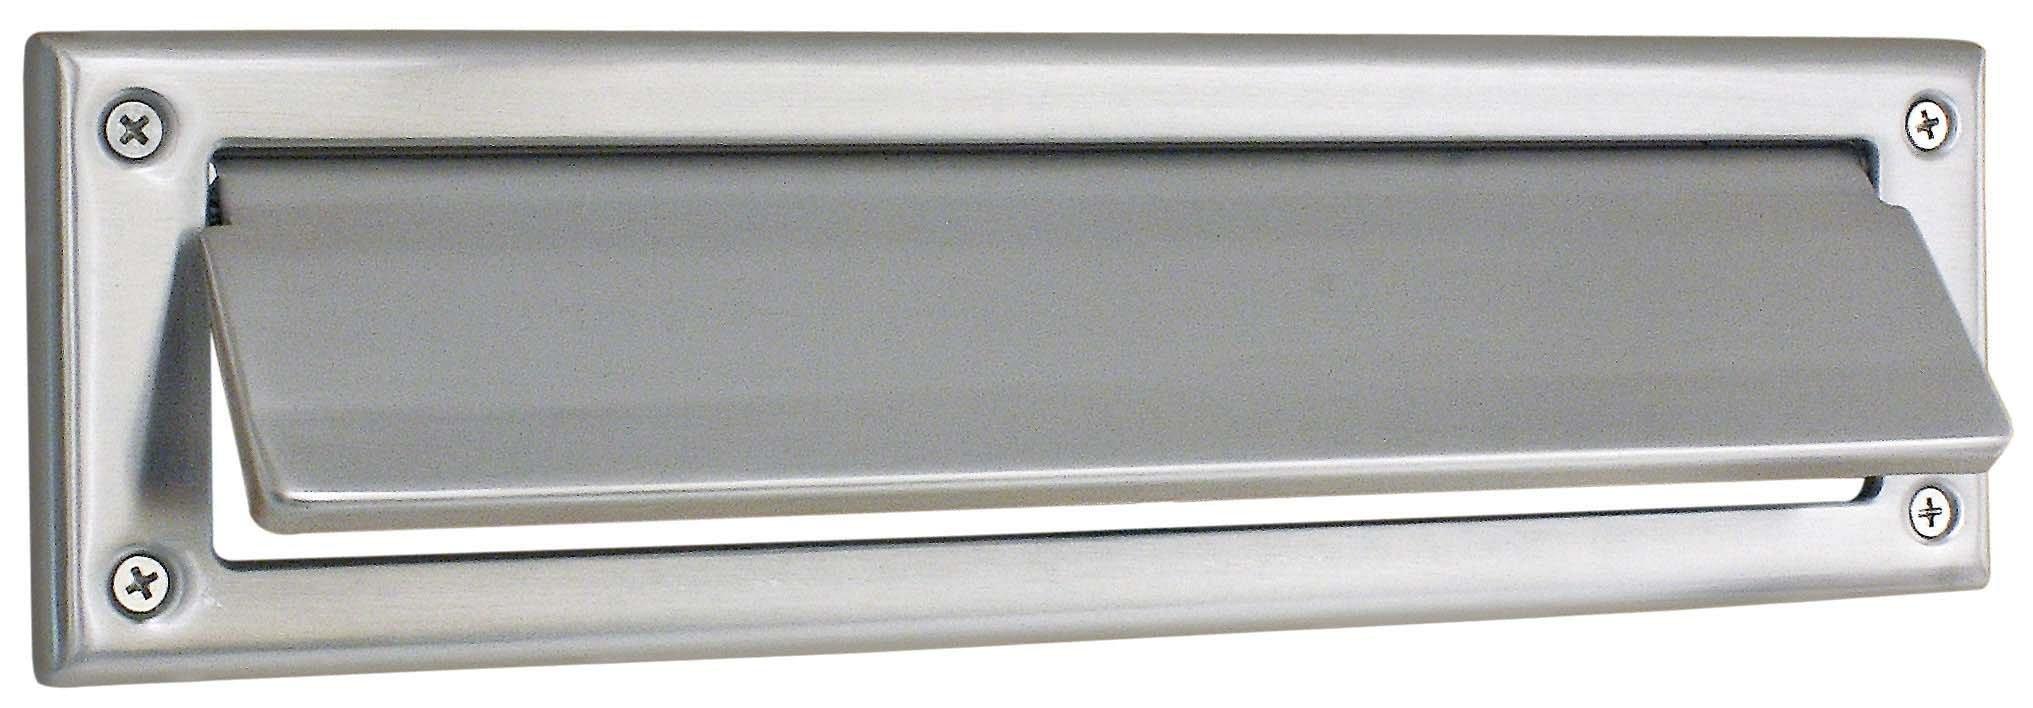 Emtek 2280 13-1/16'' Length x 3-3/8'' Height Solid Brass Mail Slot, Oil Rubbed Bronze